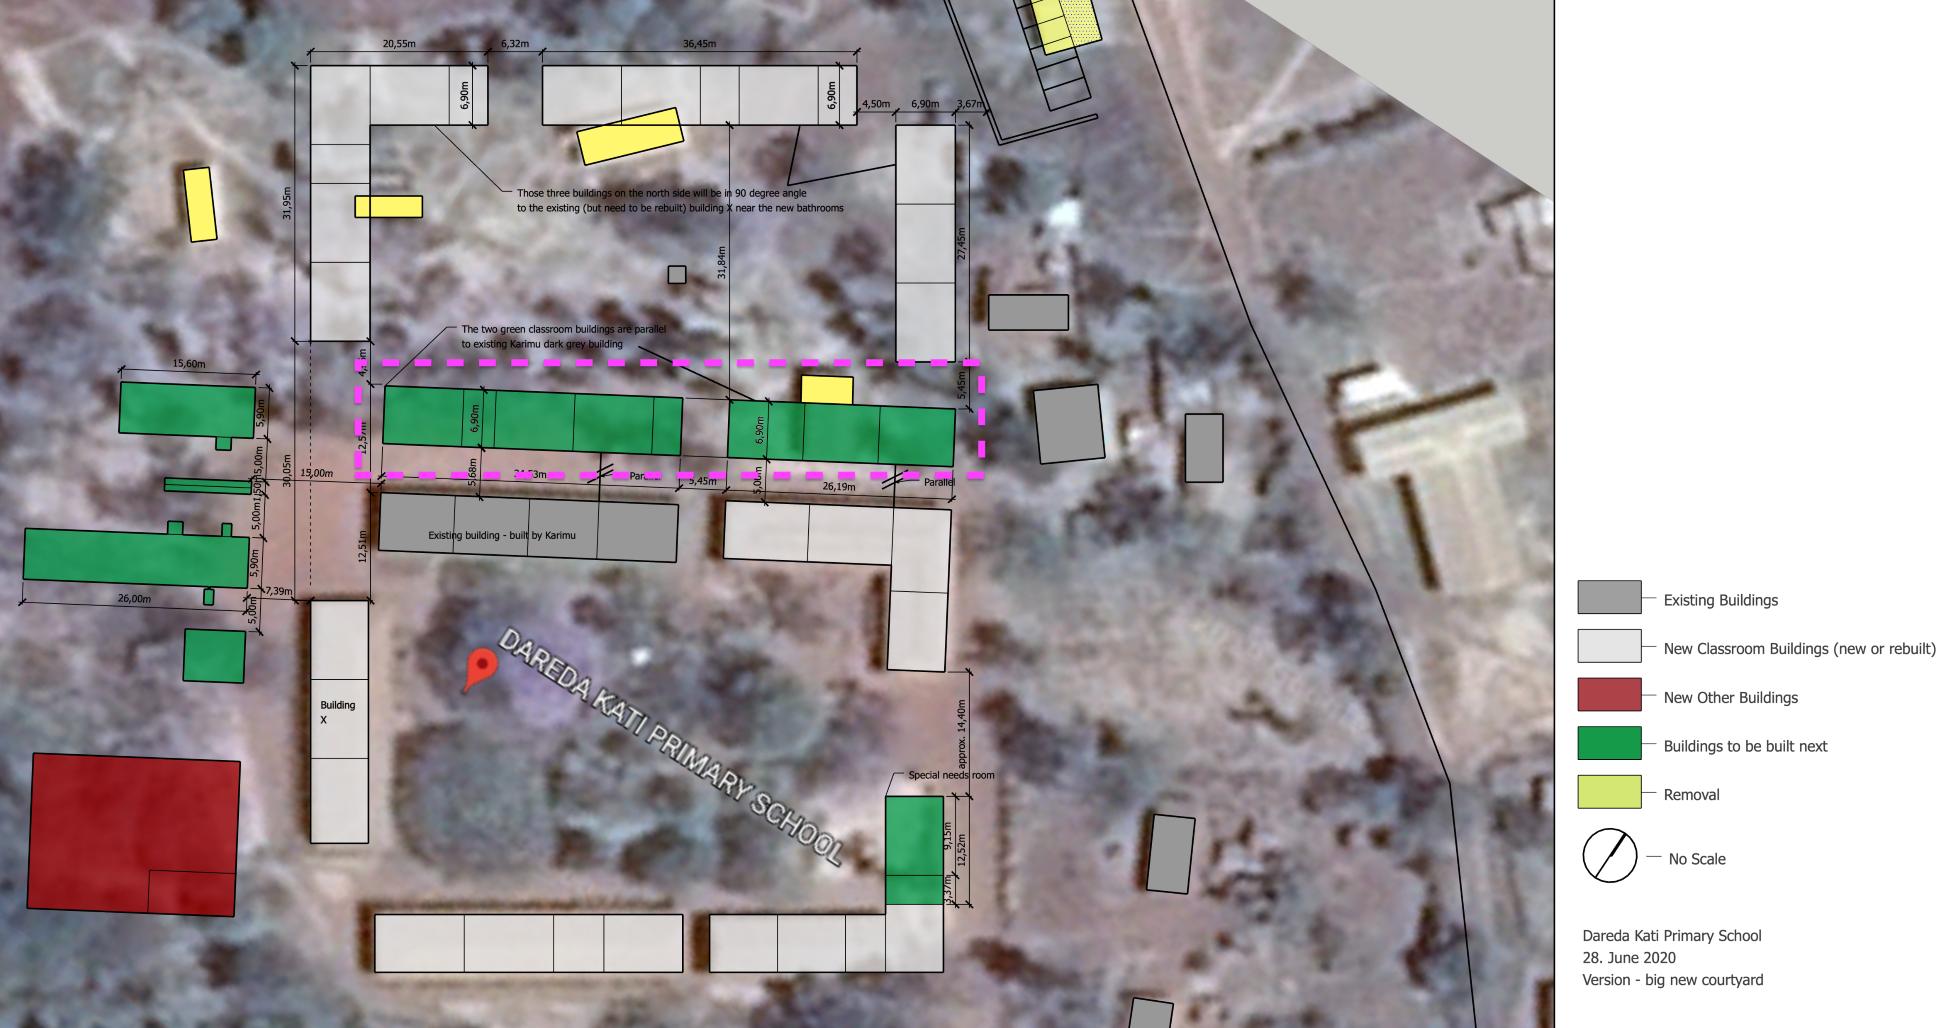 2020-07-01_Dareda Kati Primary School Construction Phase 1_Copy.png